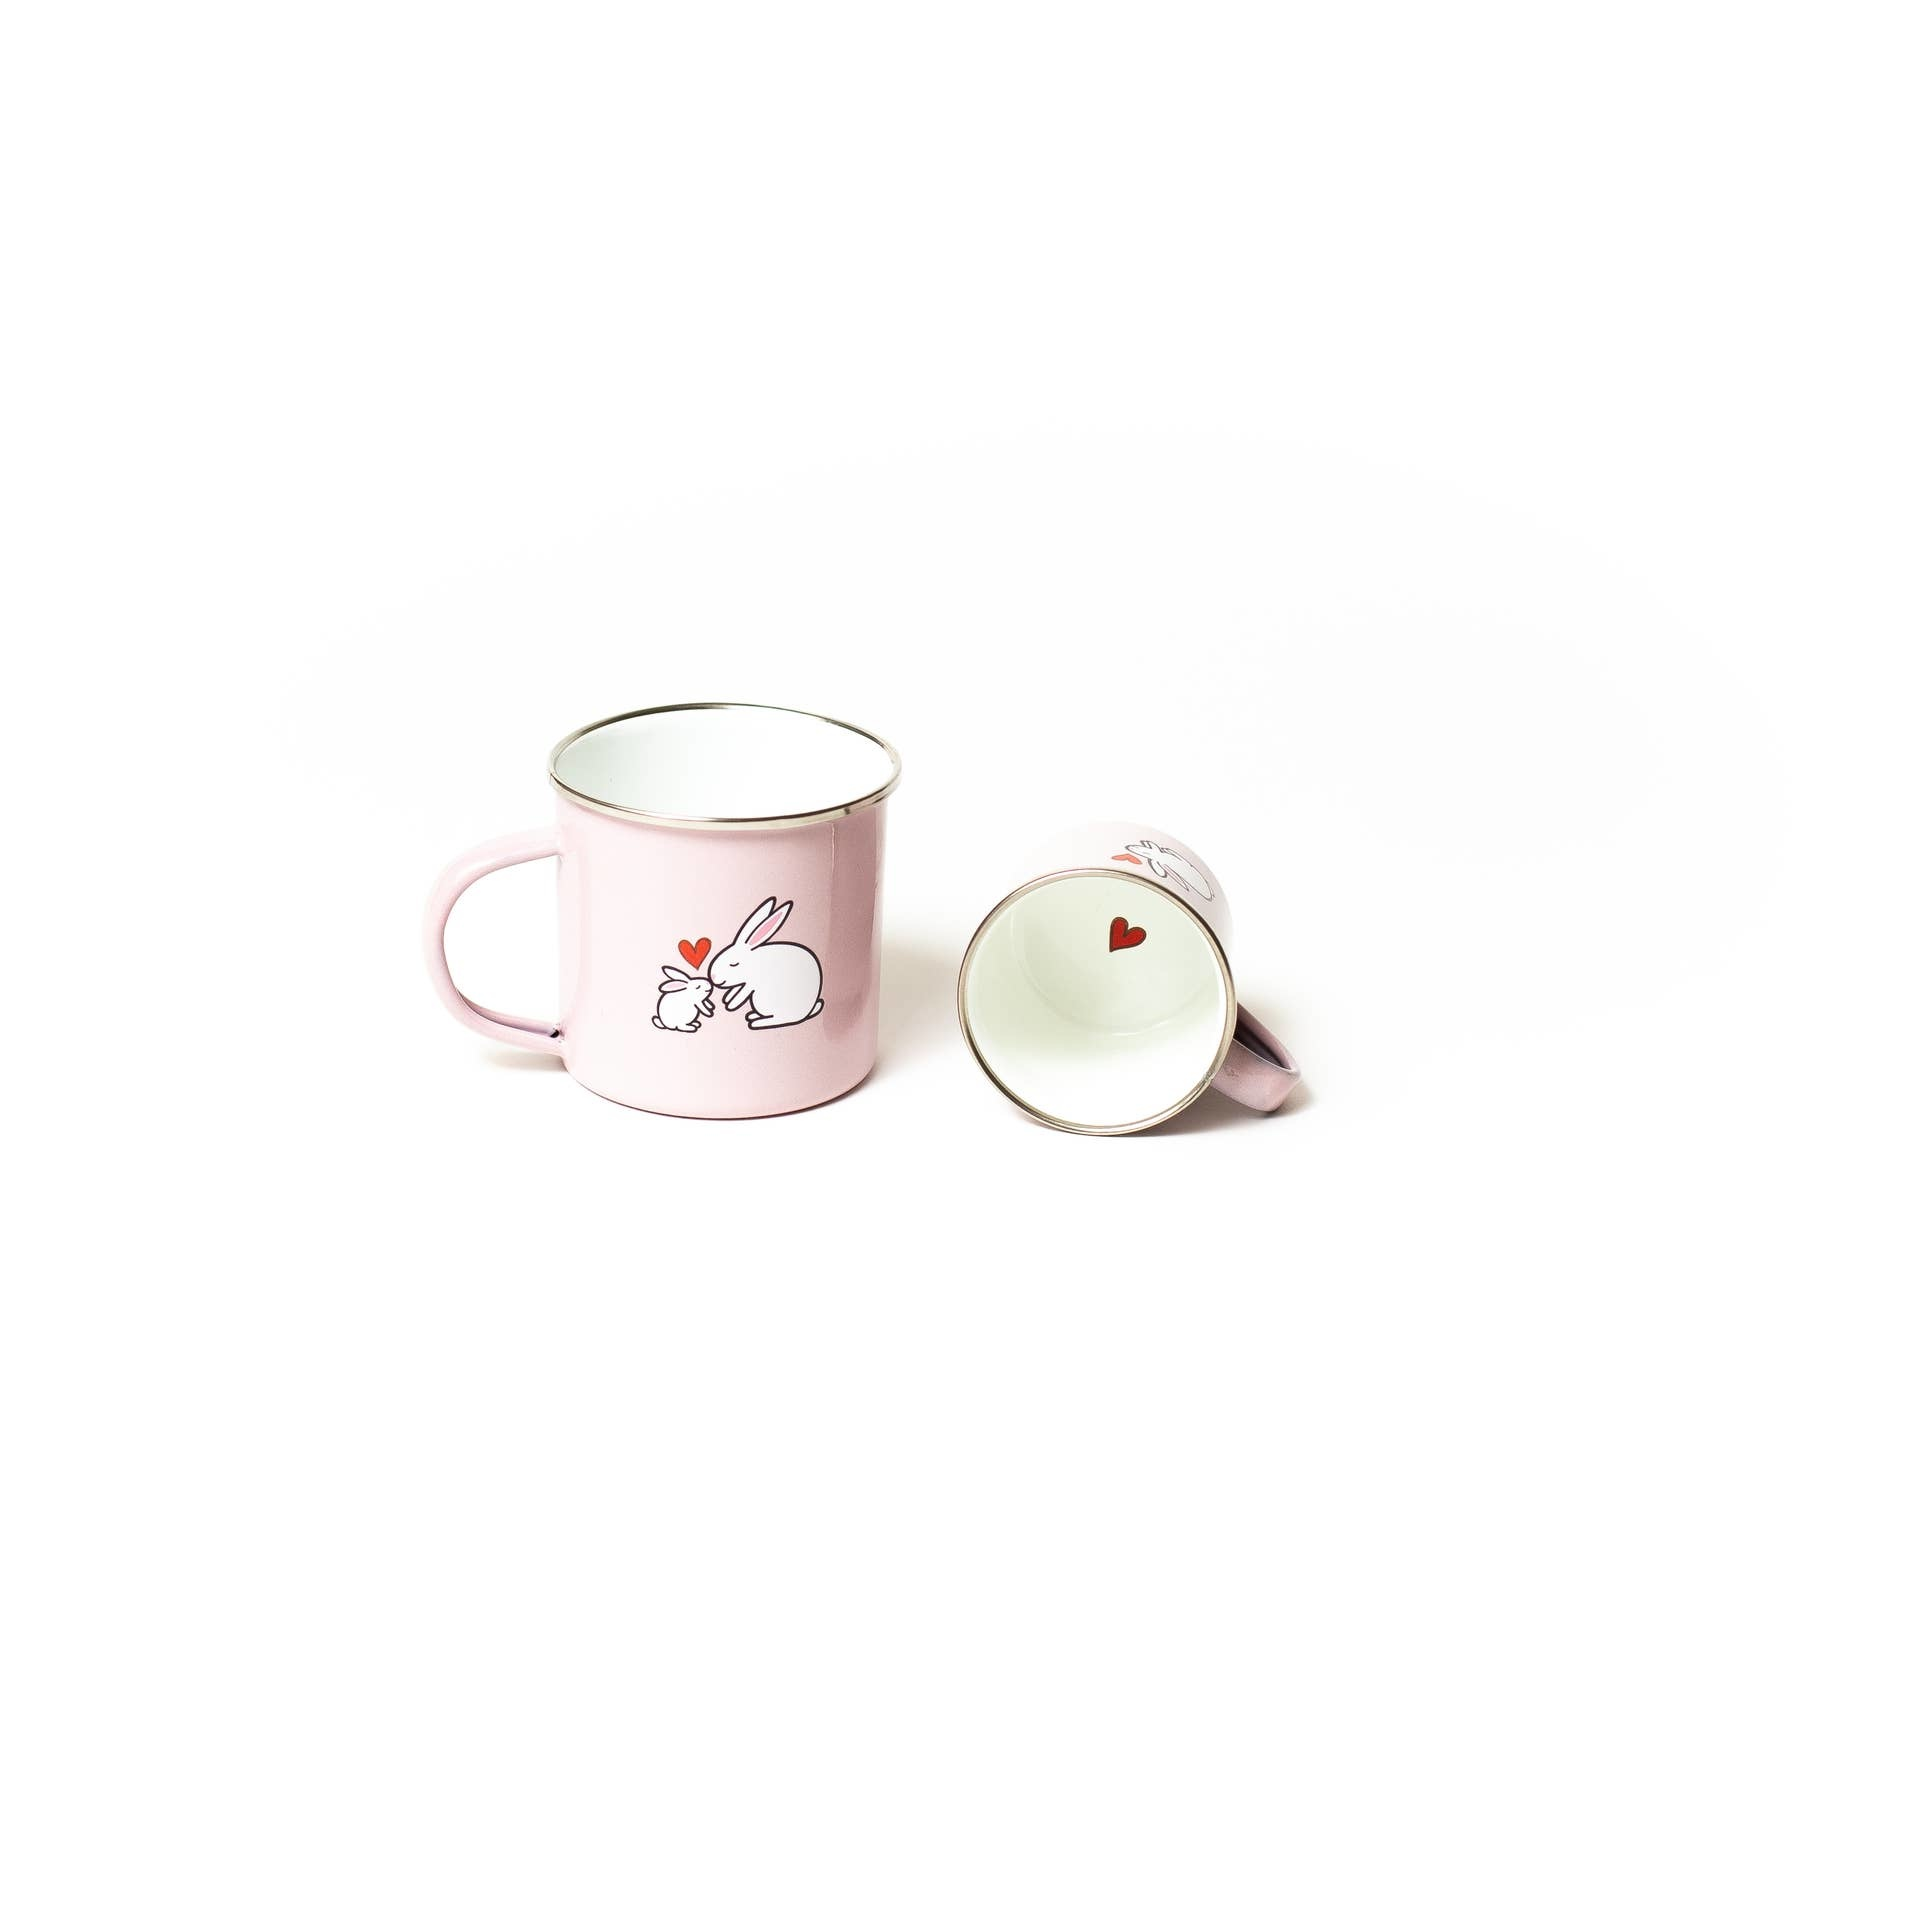 Jack Rabbit Creations Tea for Two Enamelware